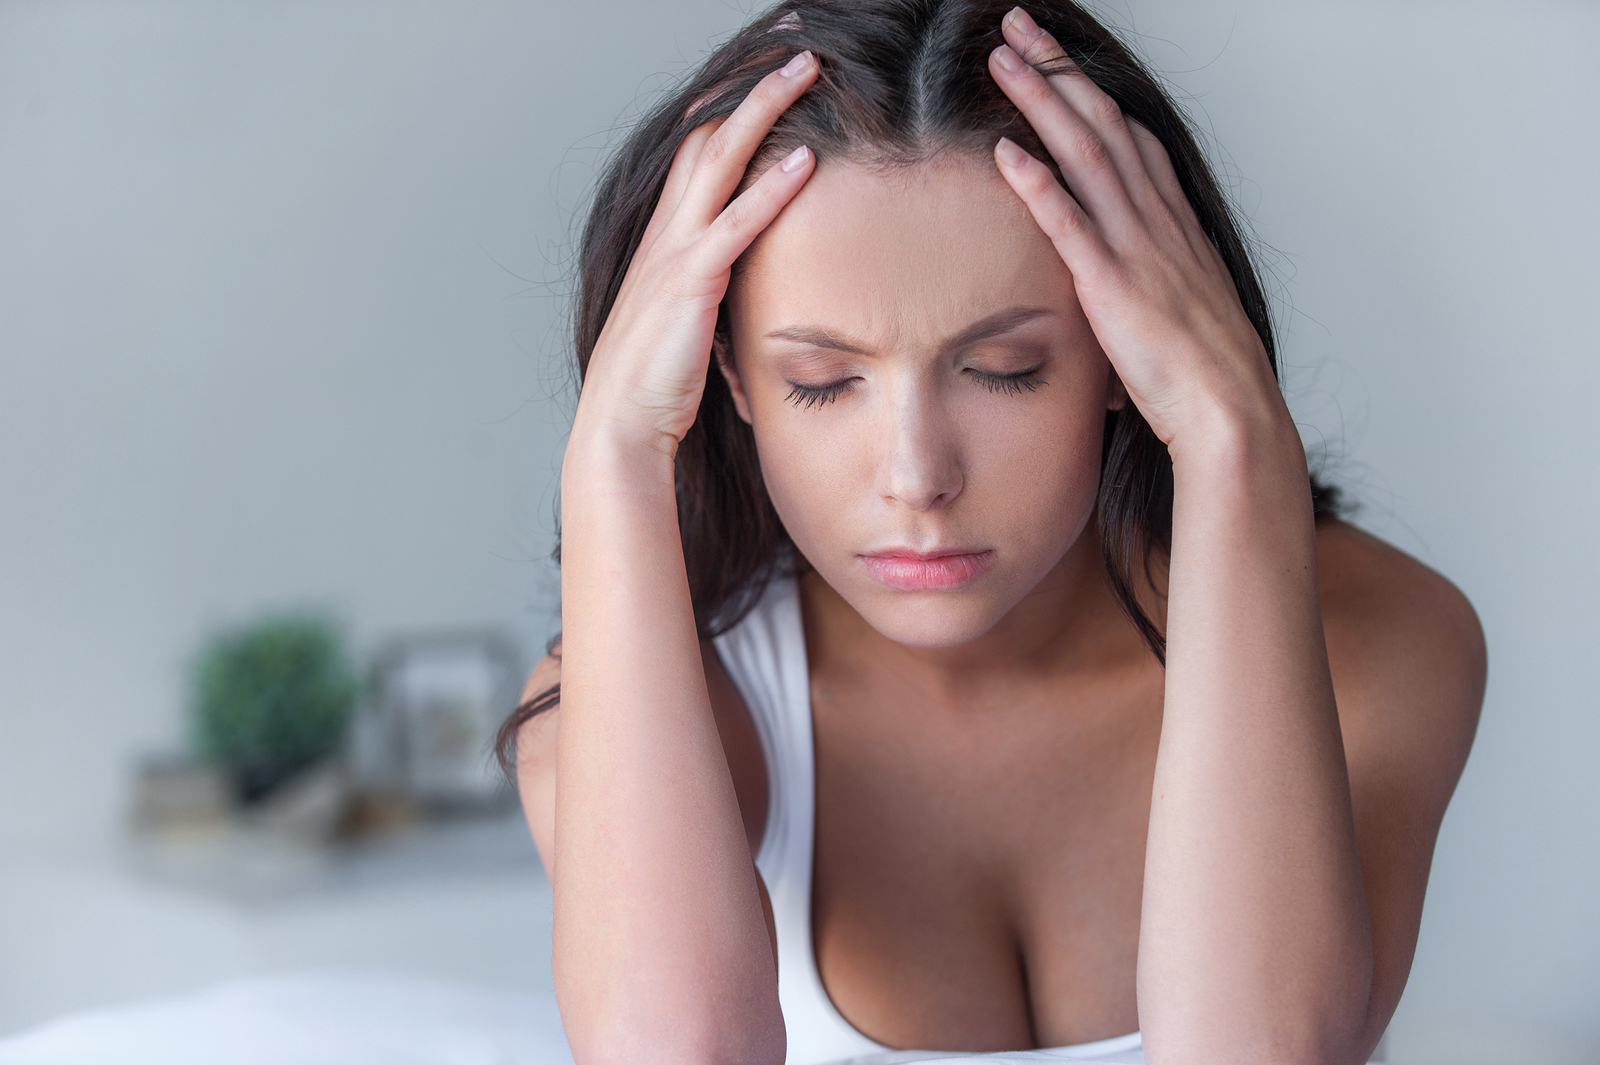 remedies for dizziness